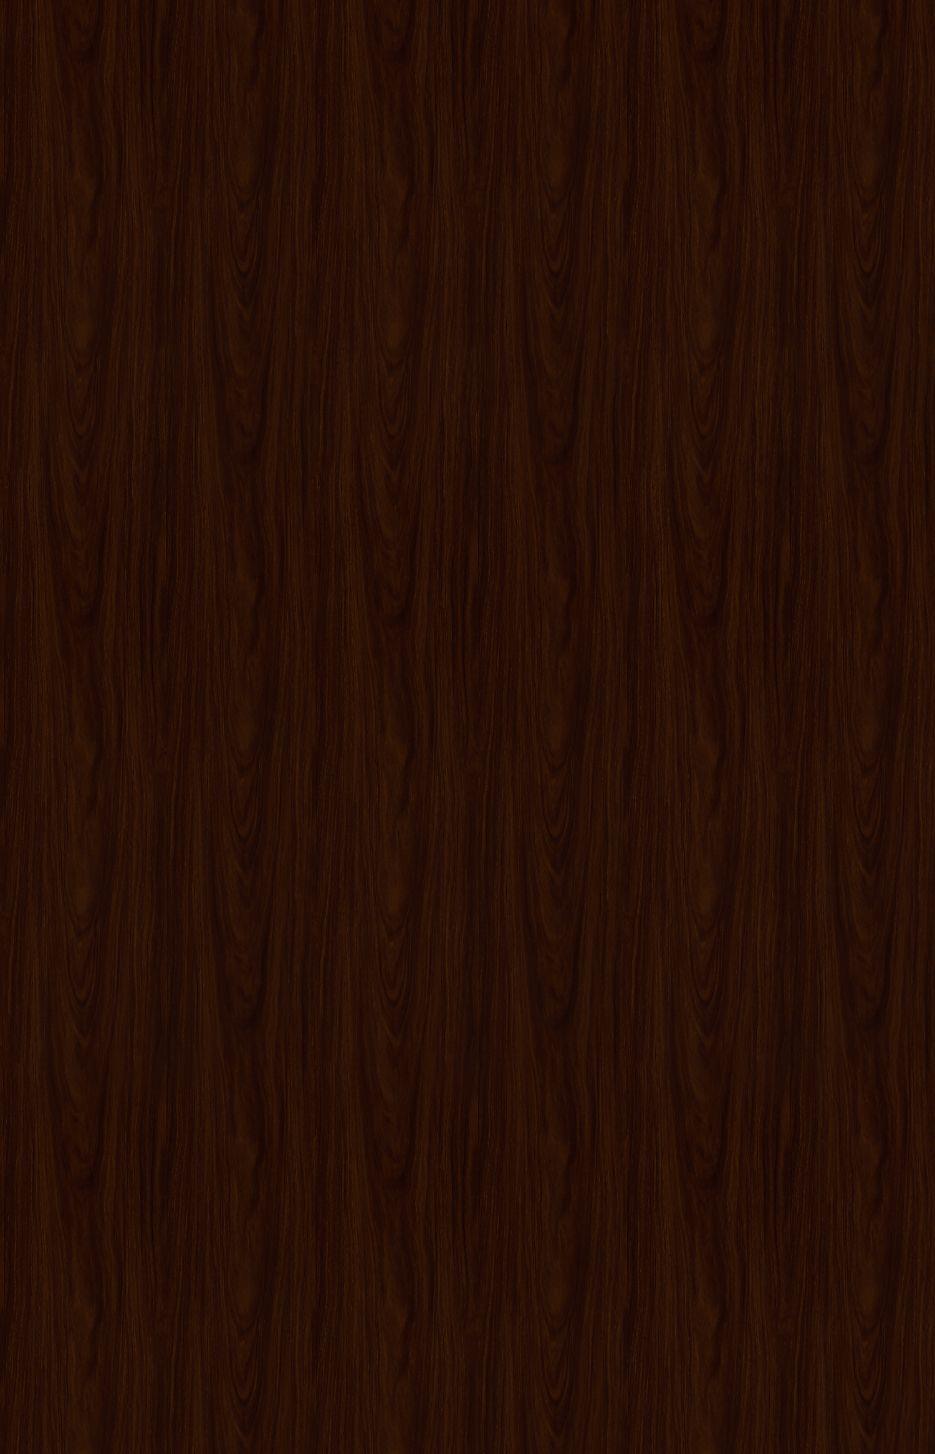 Ảnh vân gỗ 3 - Tấm lam ốp AnPro